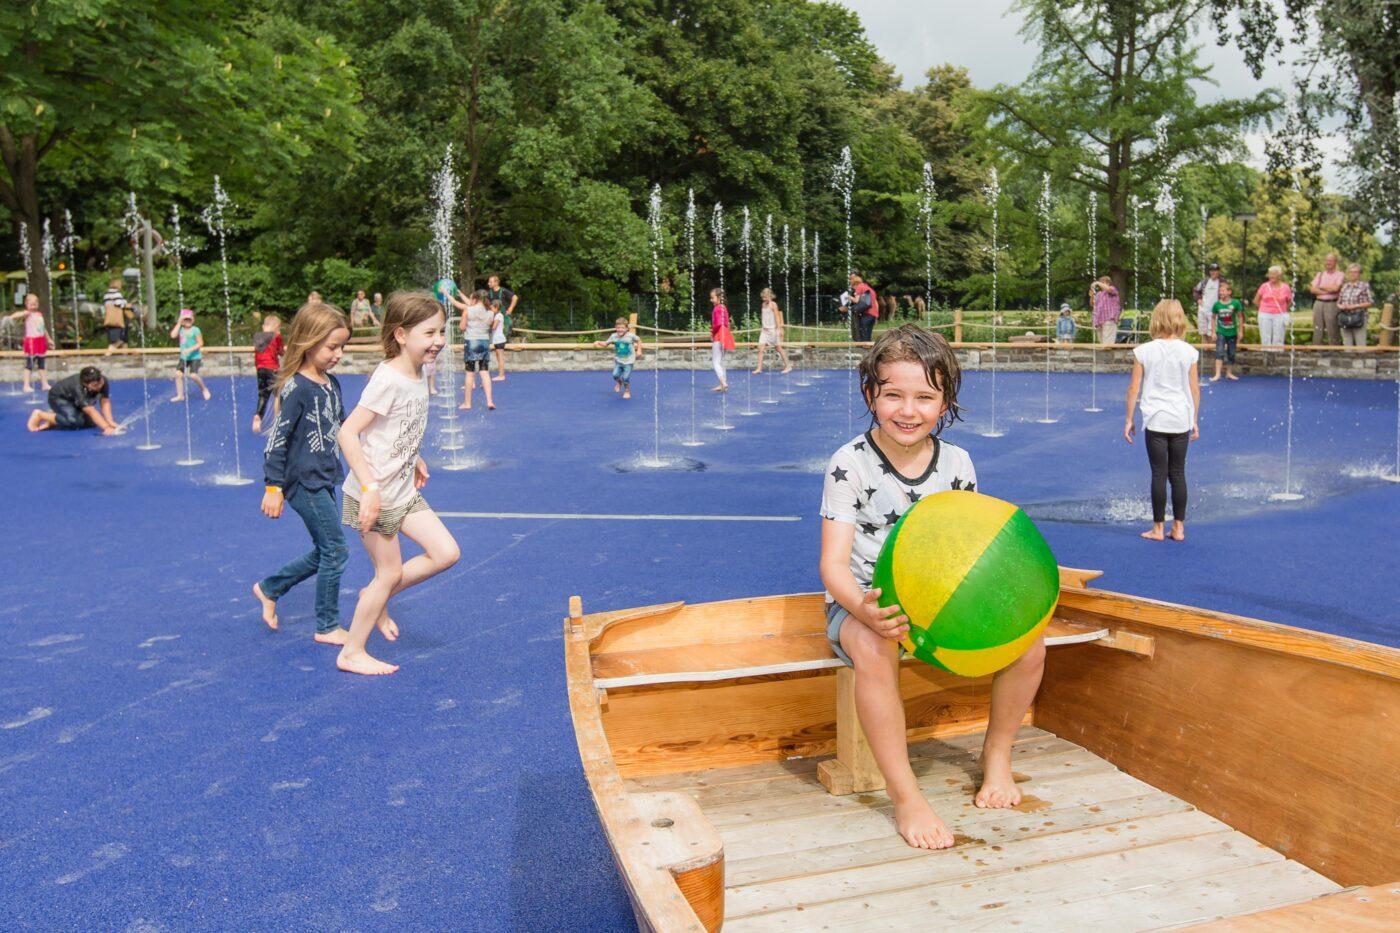 Kinderspielplatz im Tierpark Berlin | Berlin mit Kind